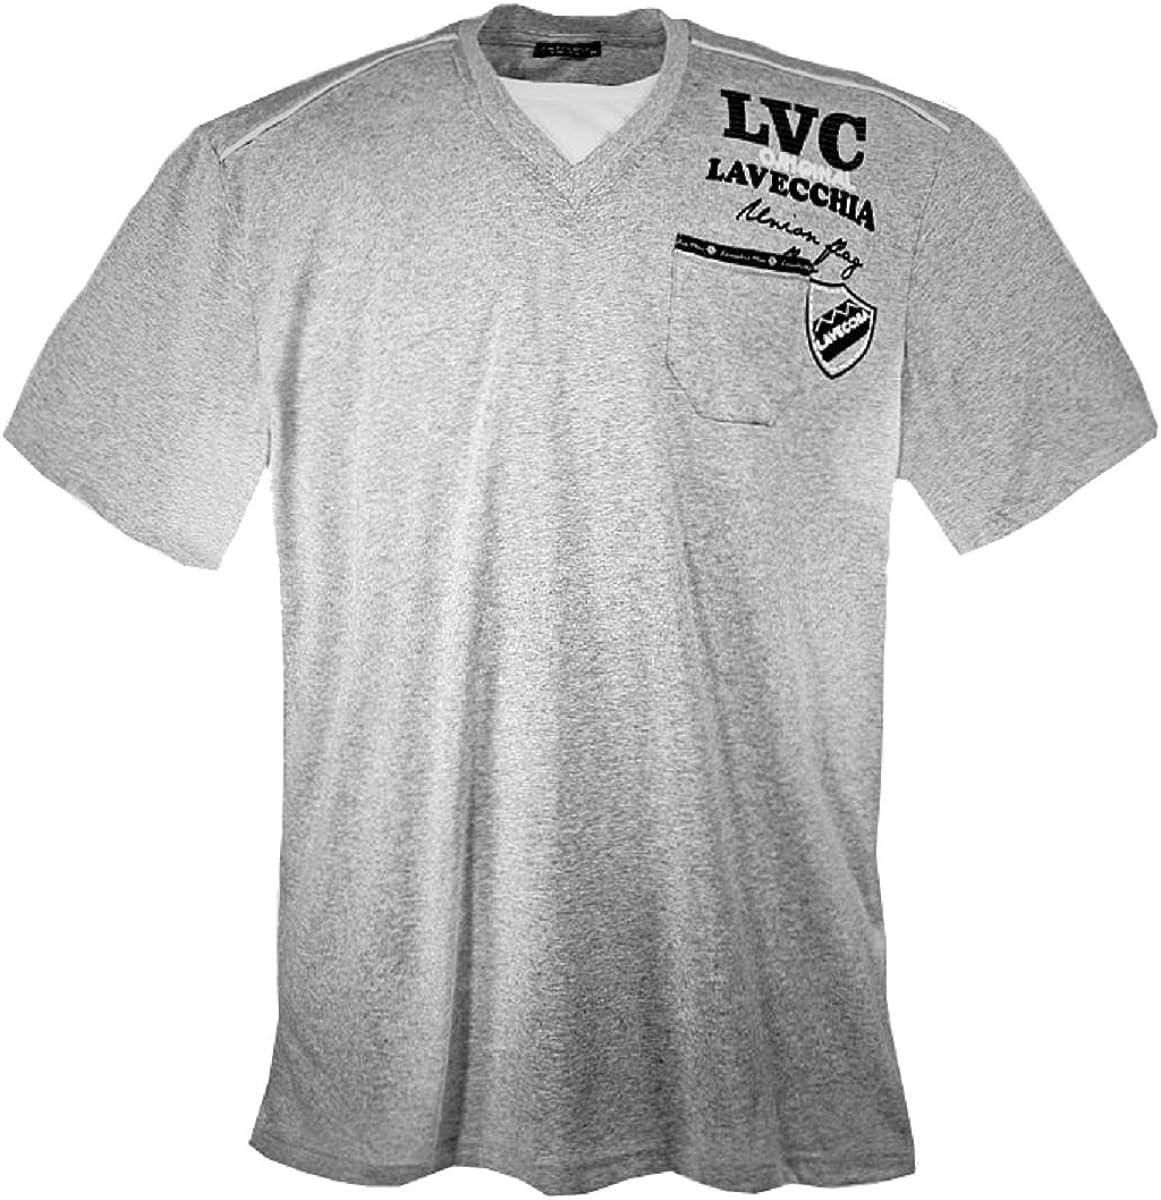 Lavecchia - Camiseta - para Hombre Gris XXXXXXL: Amazon.es: Ropa y accesorios